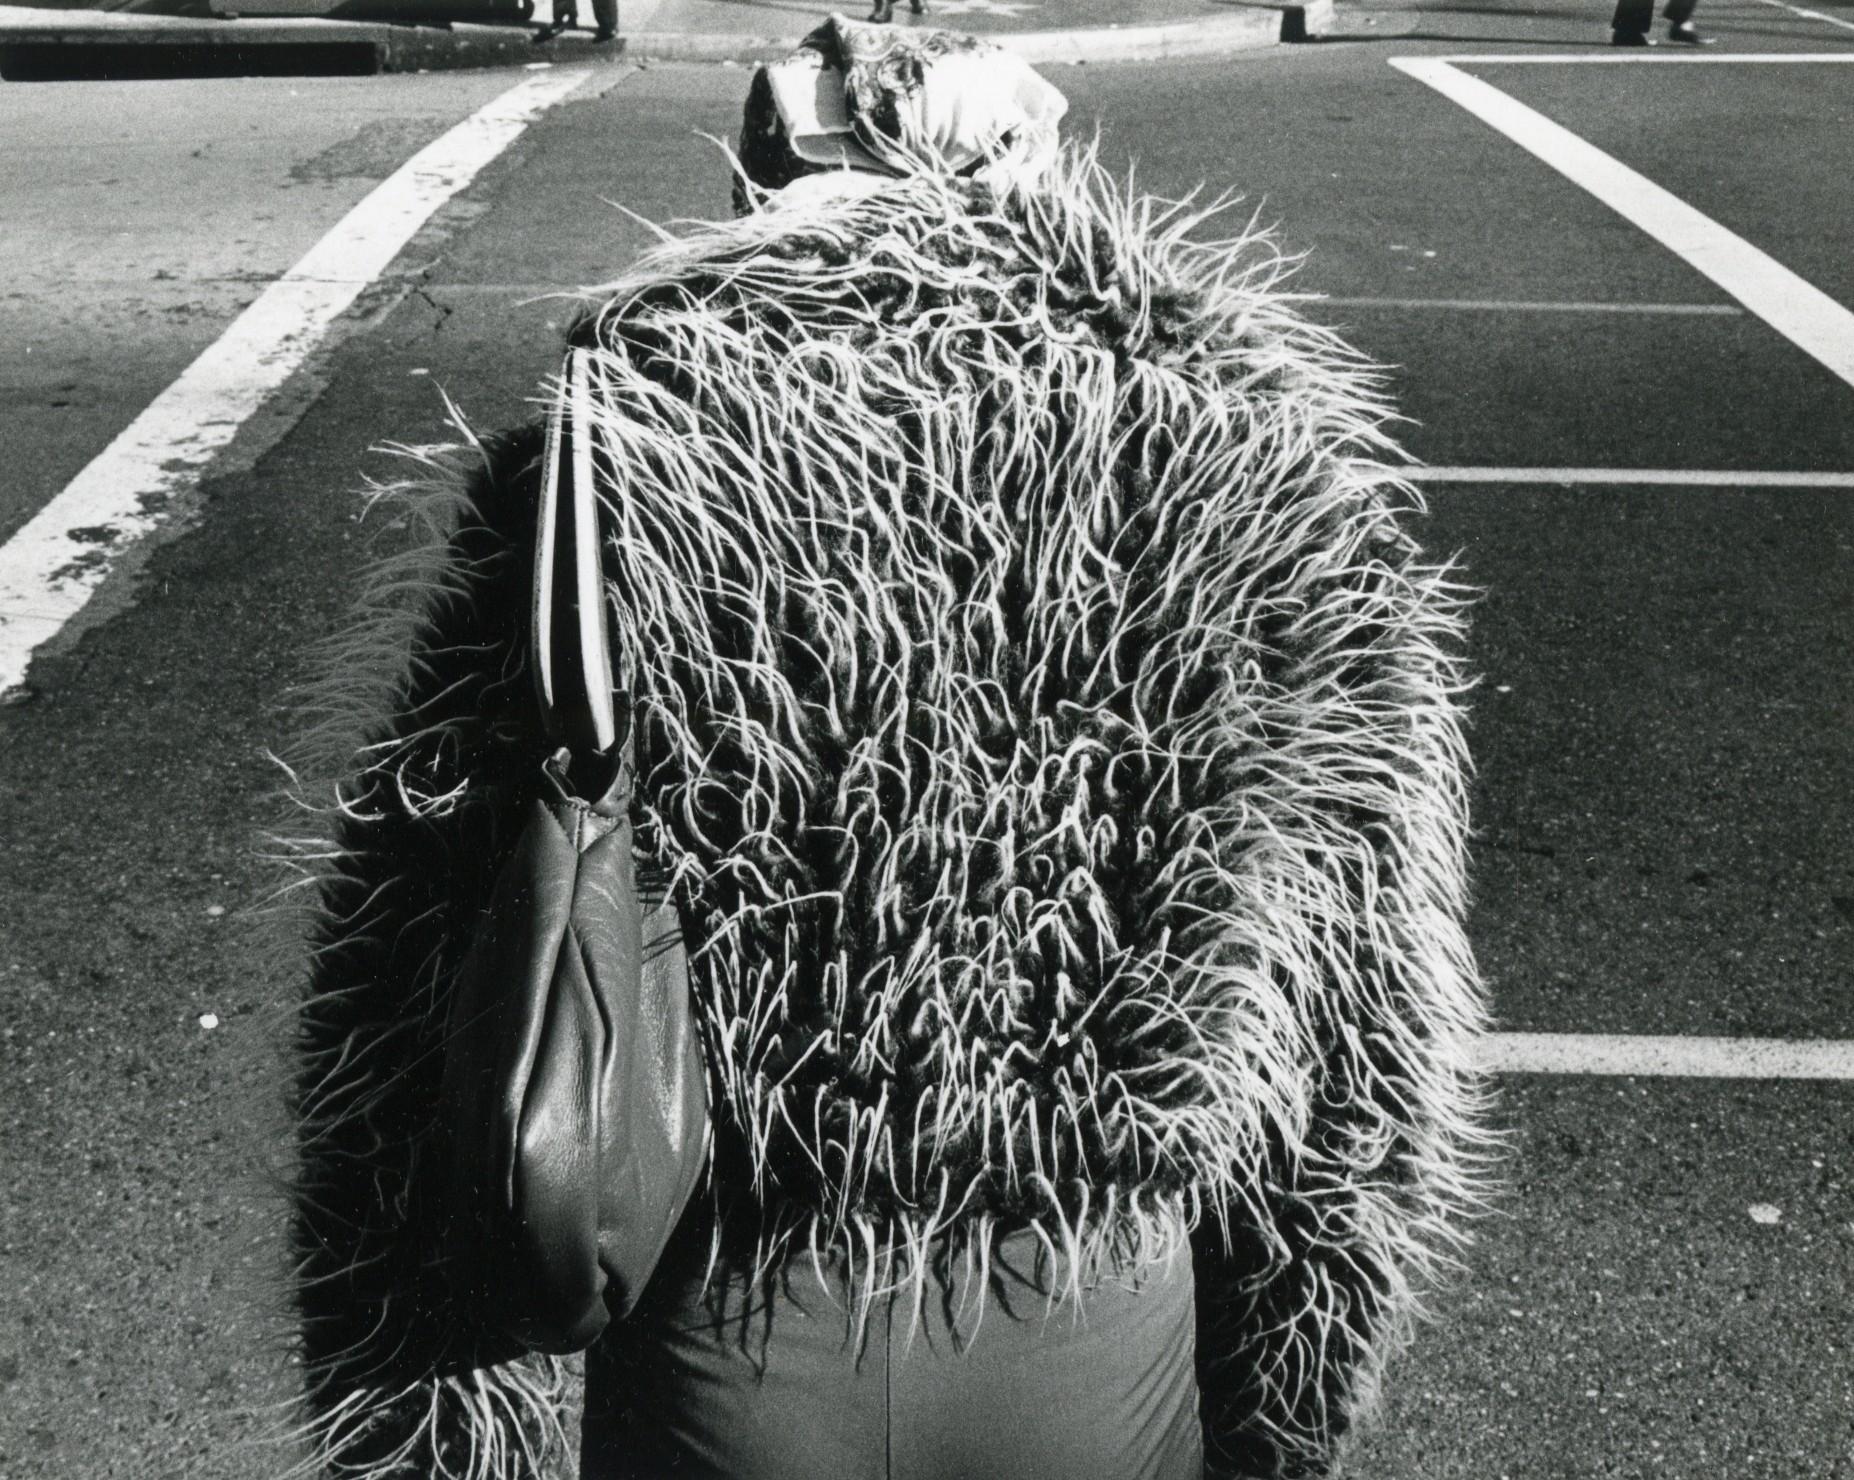 Голливуд, 1971. Фотограф Гэри Крюгер